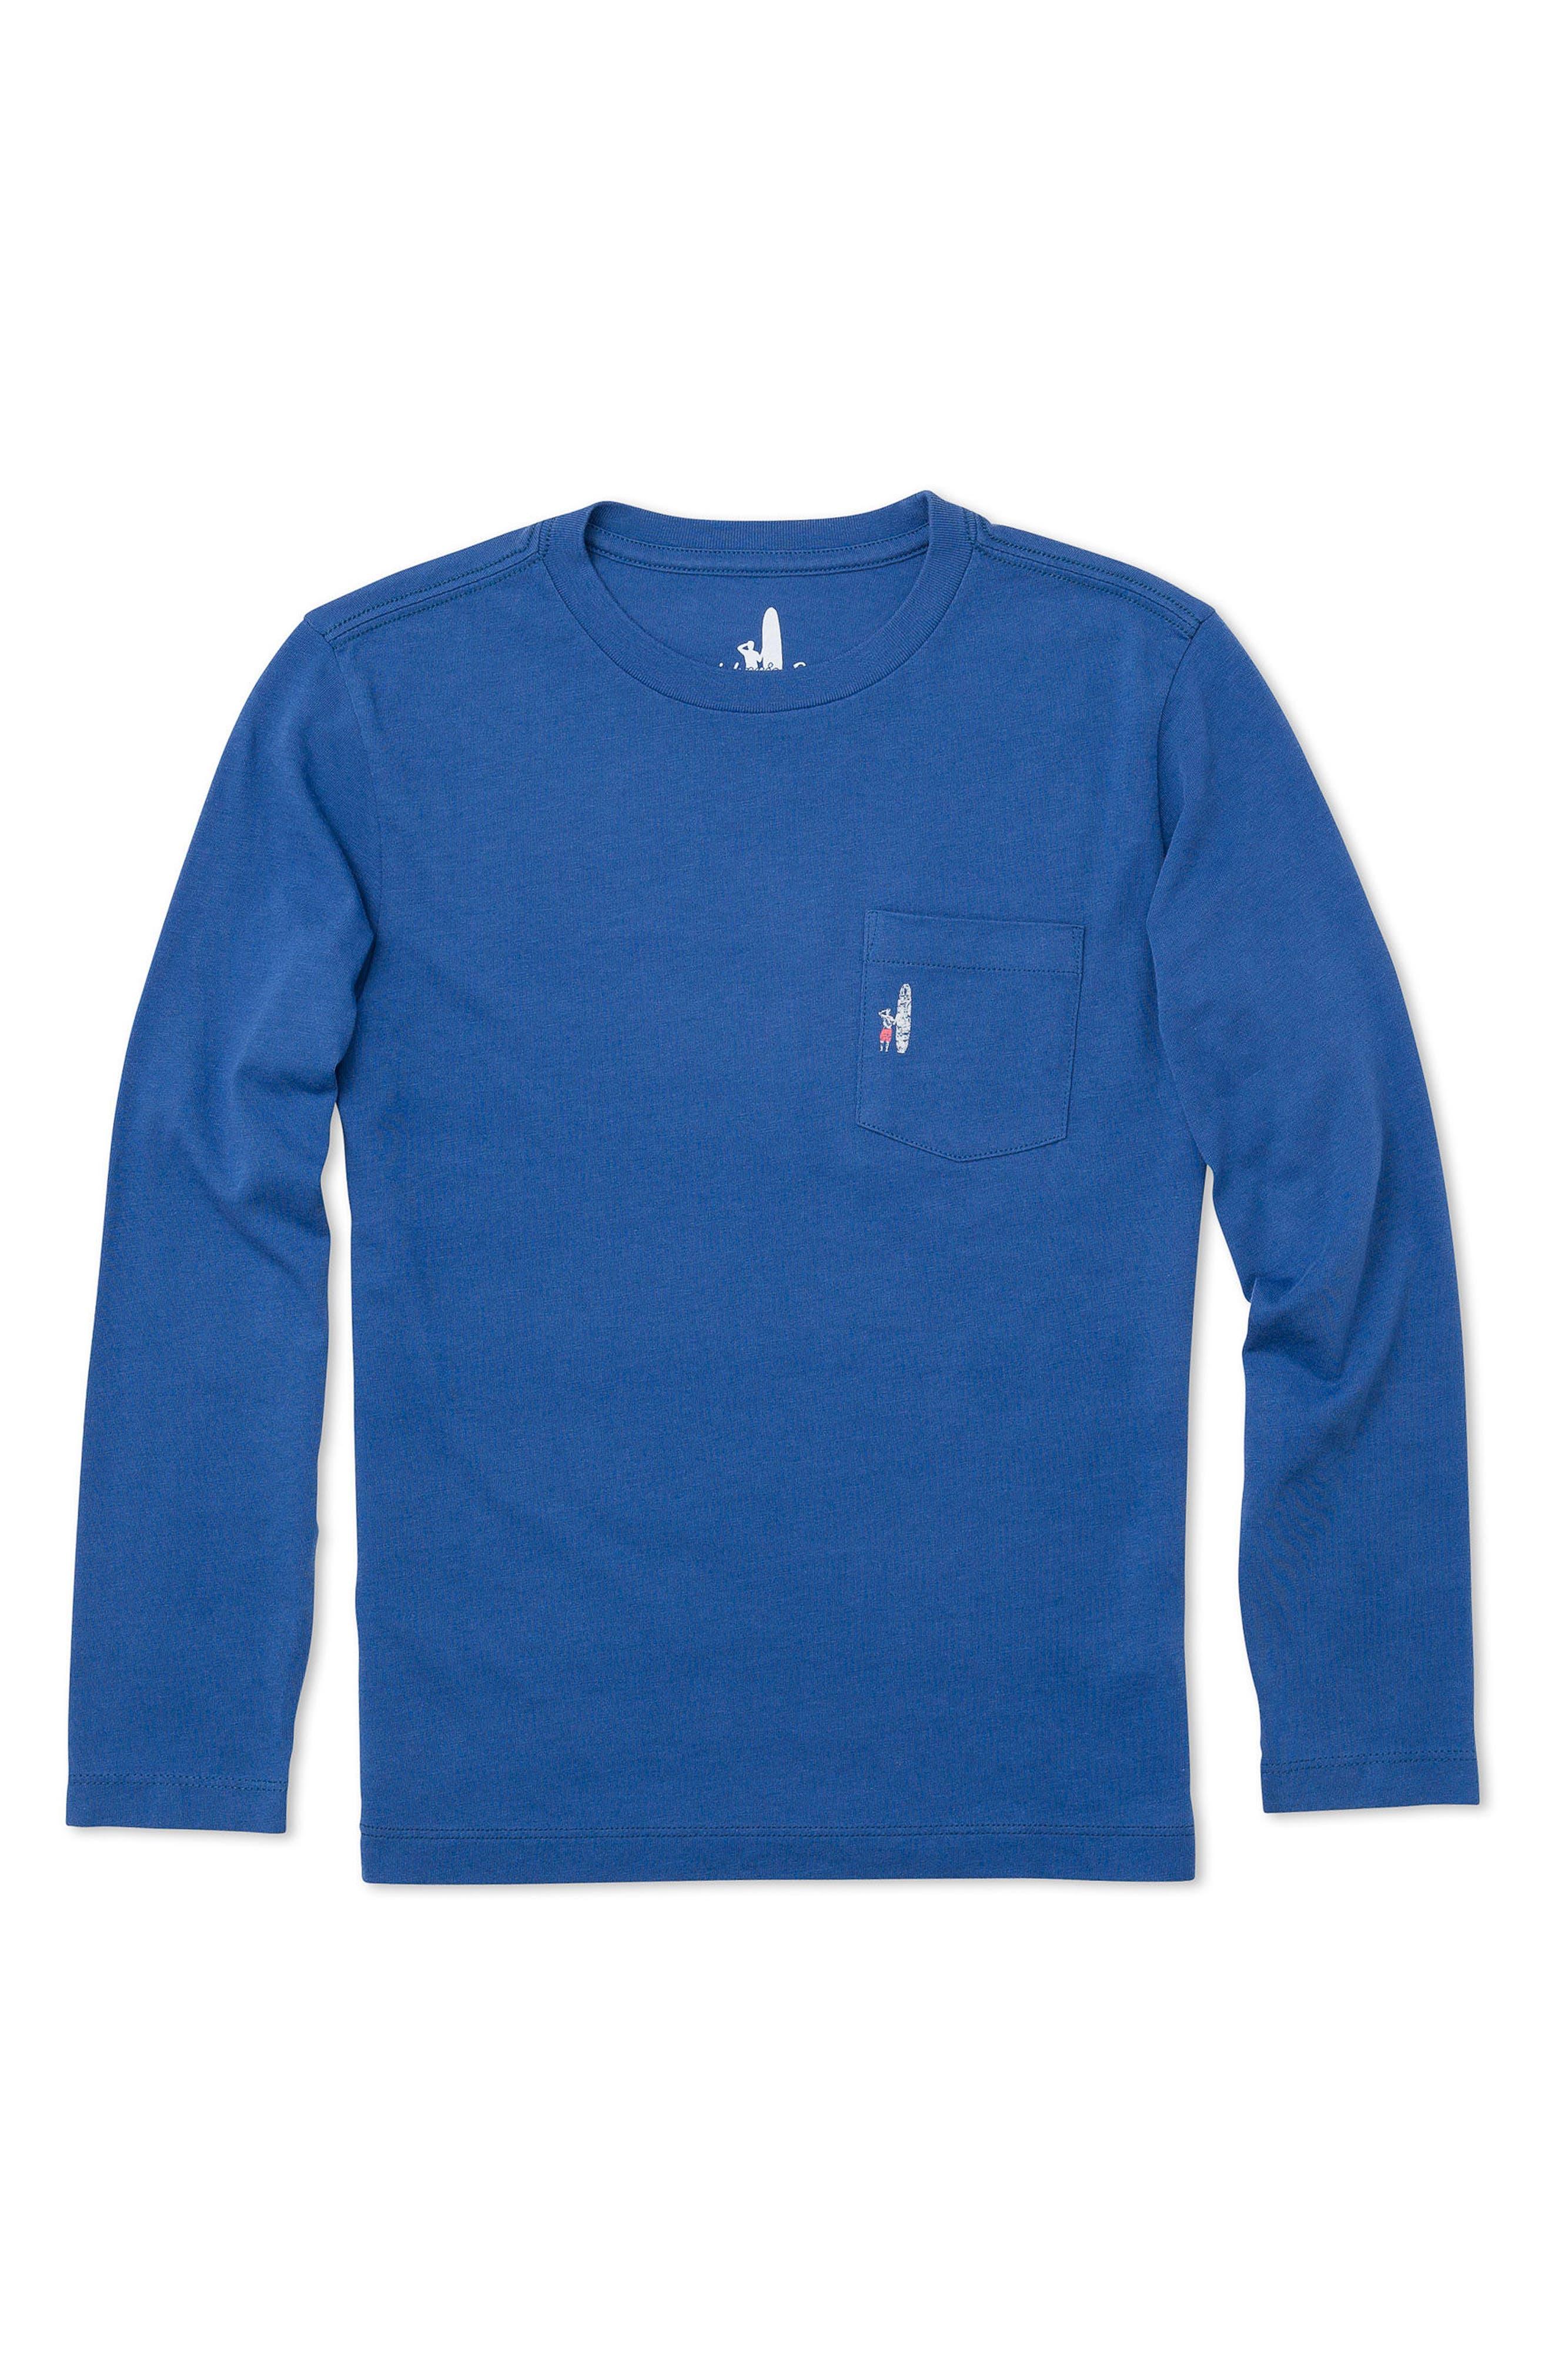 Main Image - johnnie-O Reef Break Long-Sleeve Pocket T-Shirt (Little Boys & Big Boys)